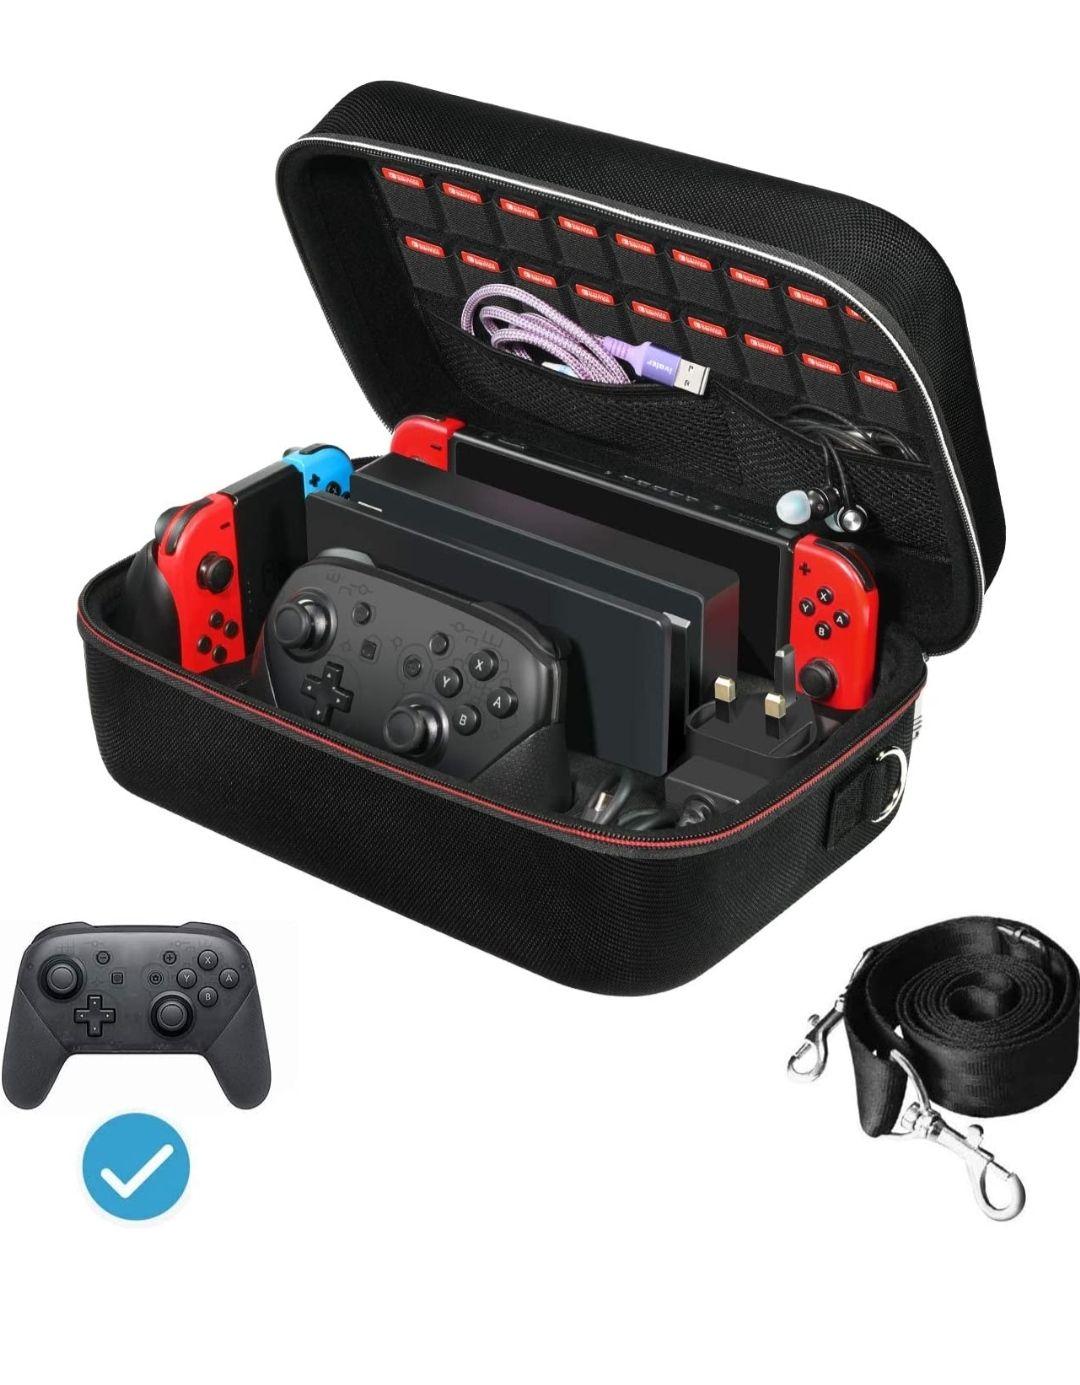 Etui deluxe pour Nintendo Switch (Vendeur tiers)